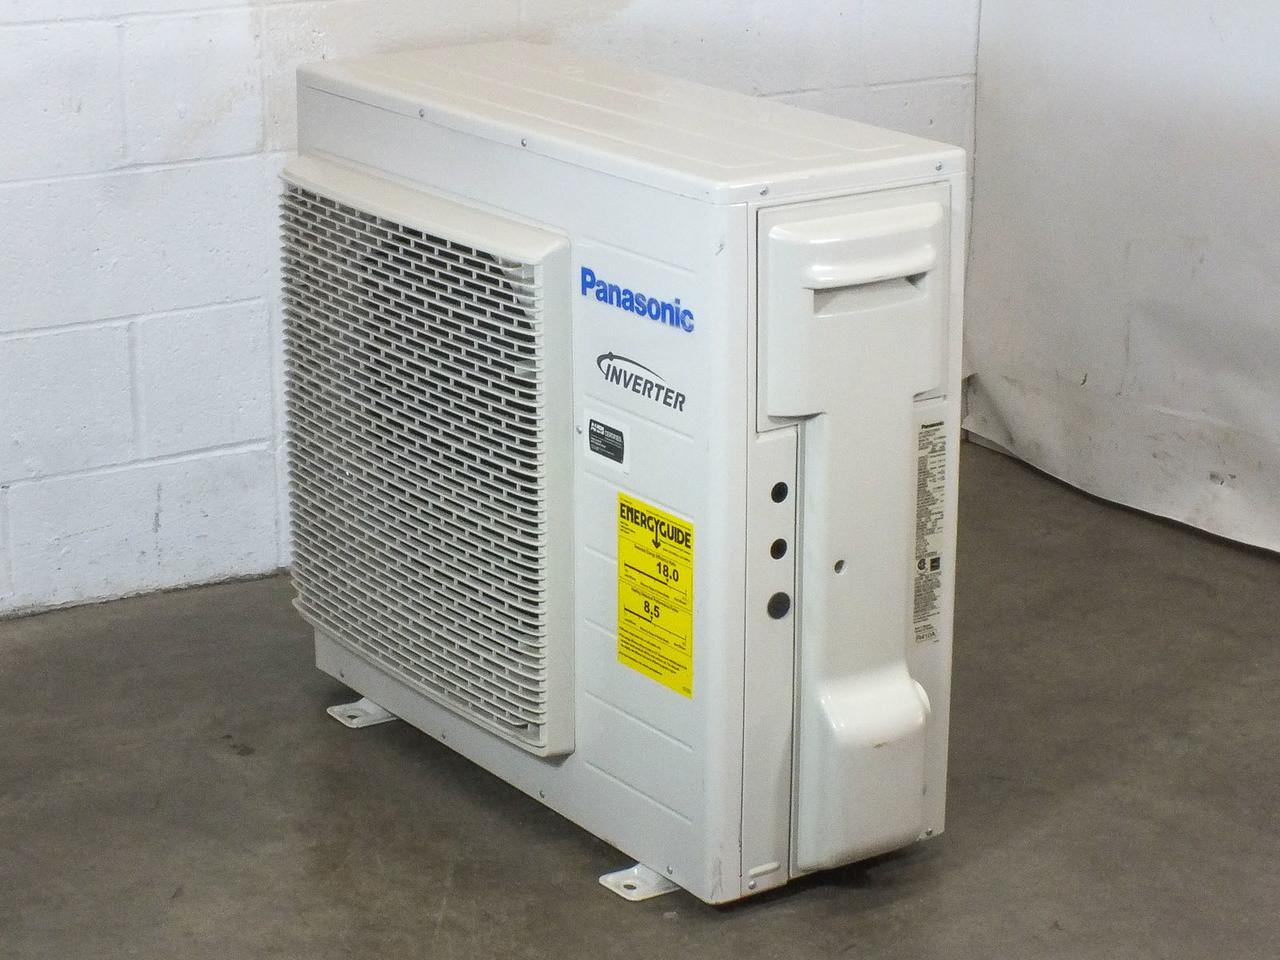 Outdoor Air Conditioner Unit 208Volt AC (Panasonic CU-E18NKU)